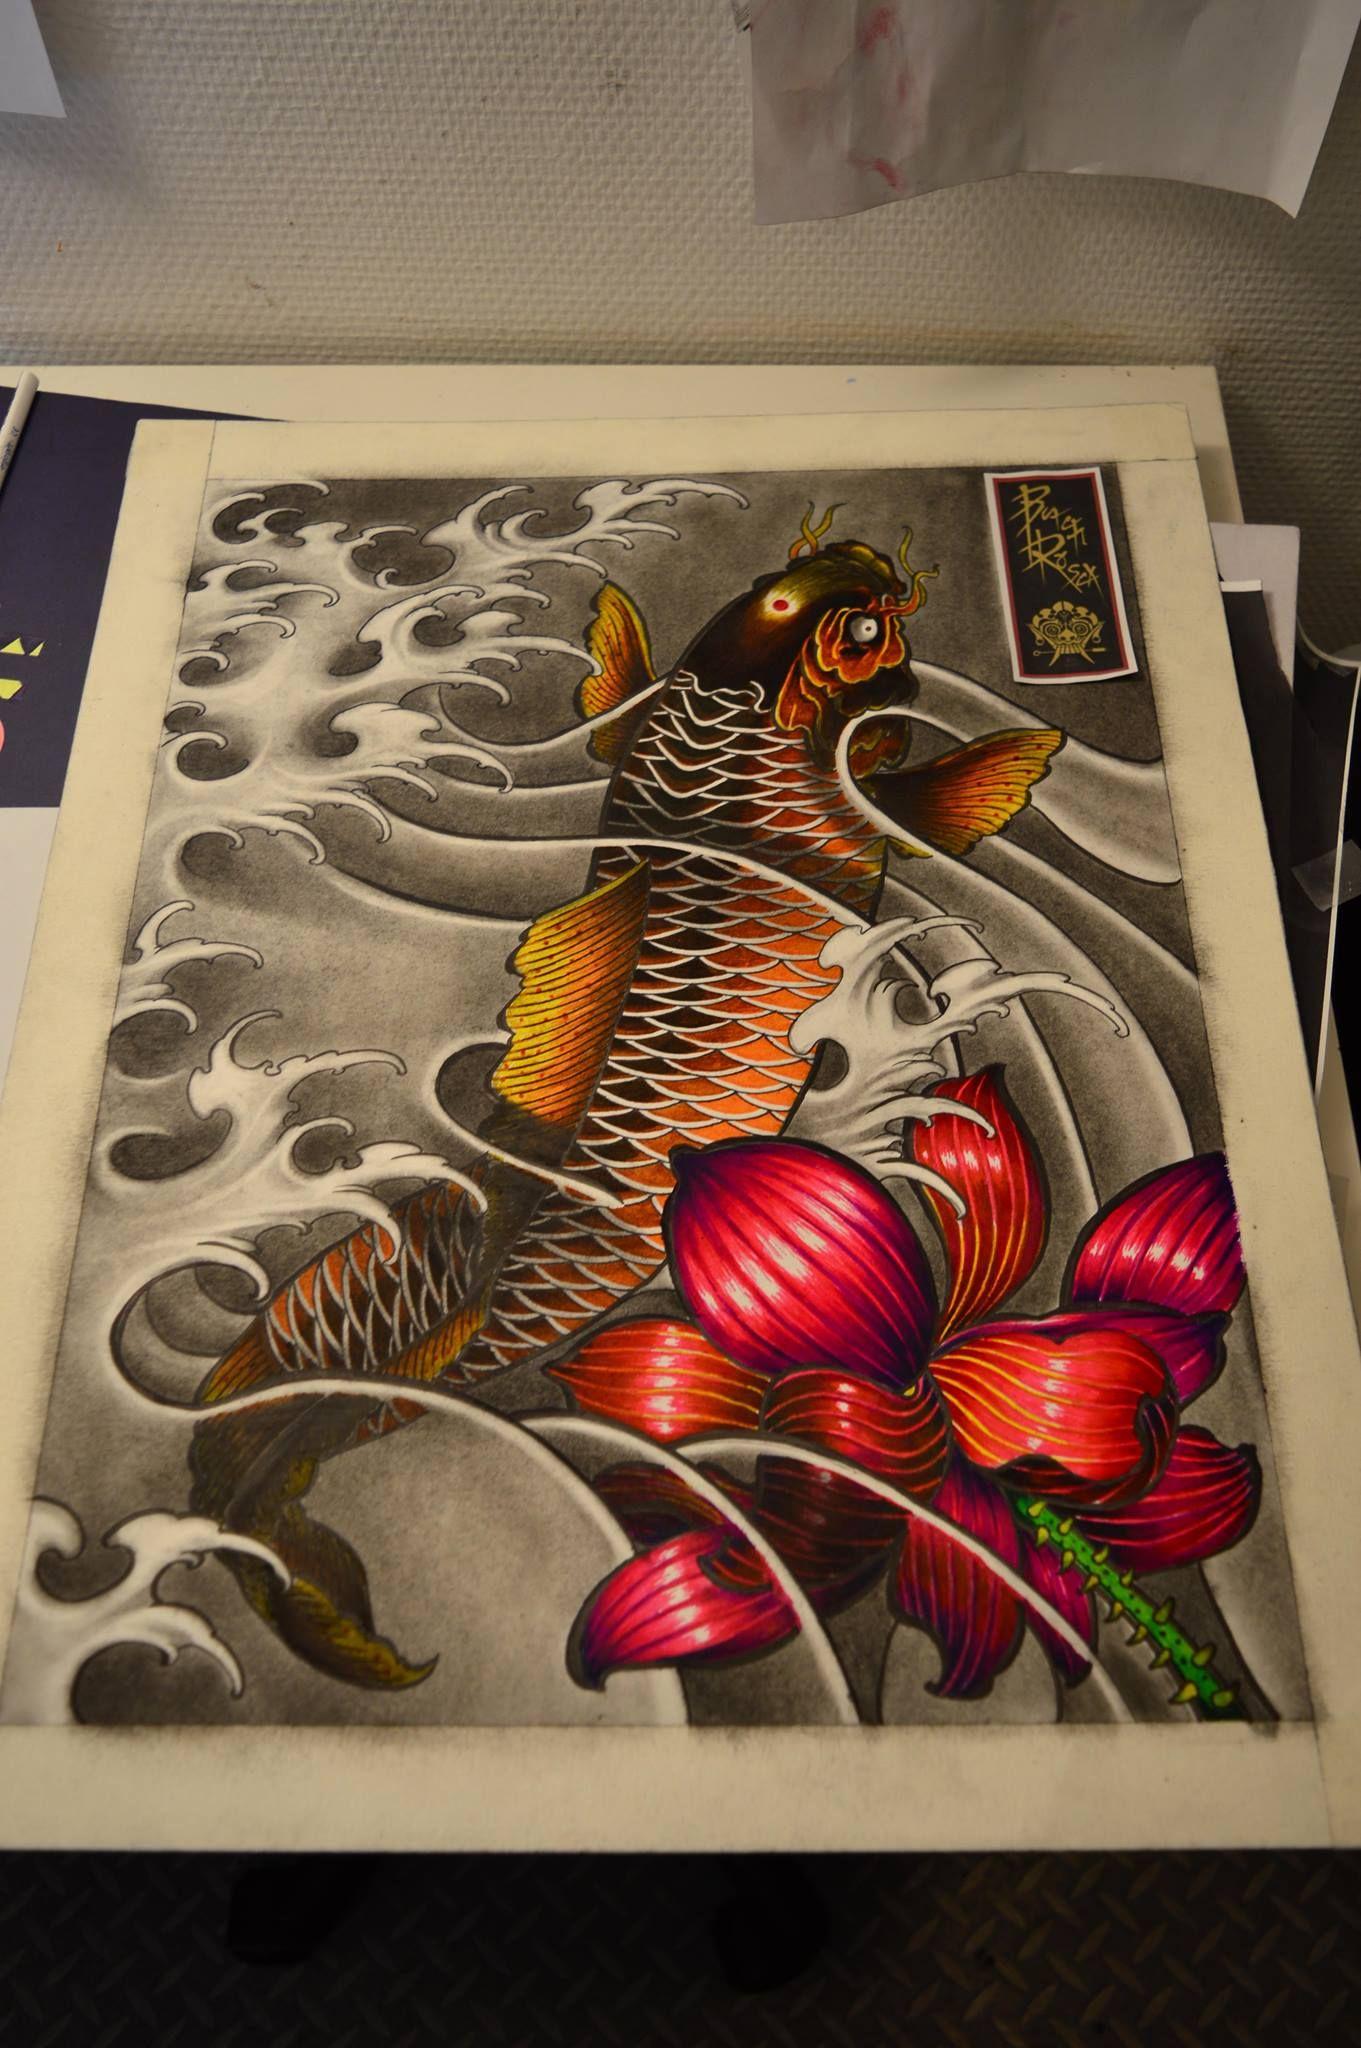 Japanese koi fish, lotus and water waves\